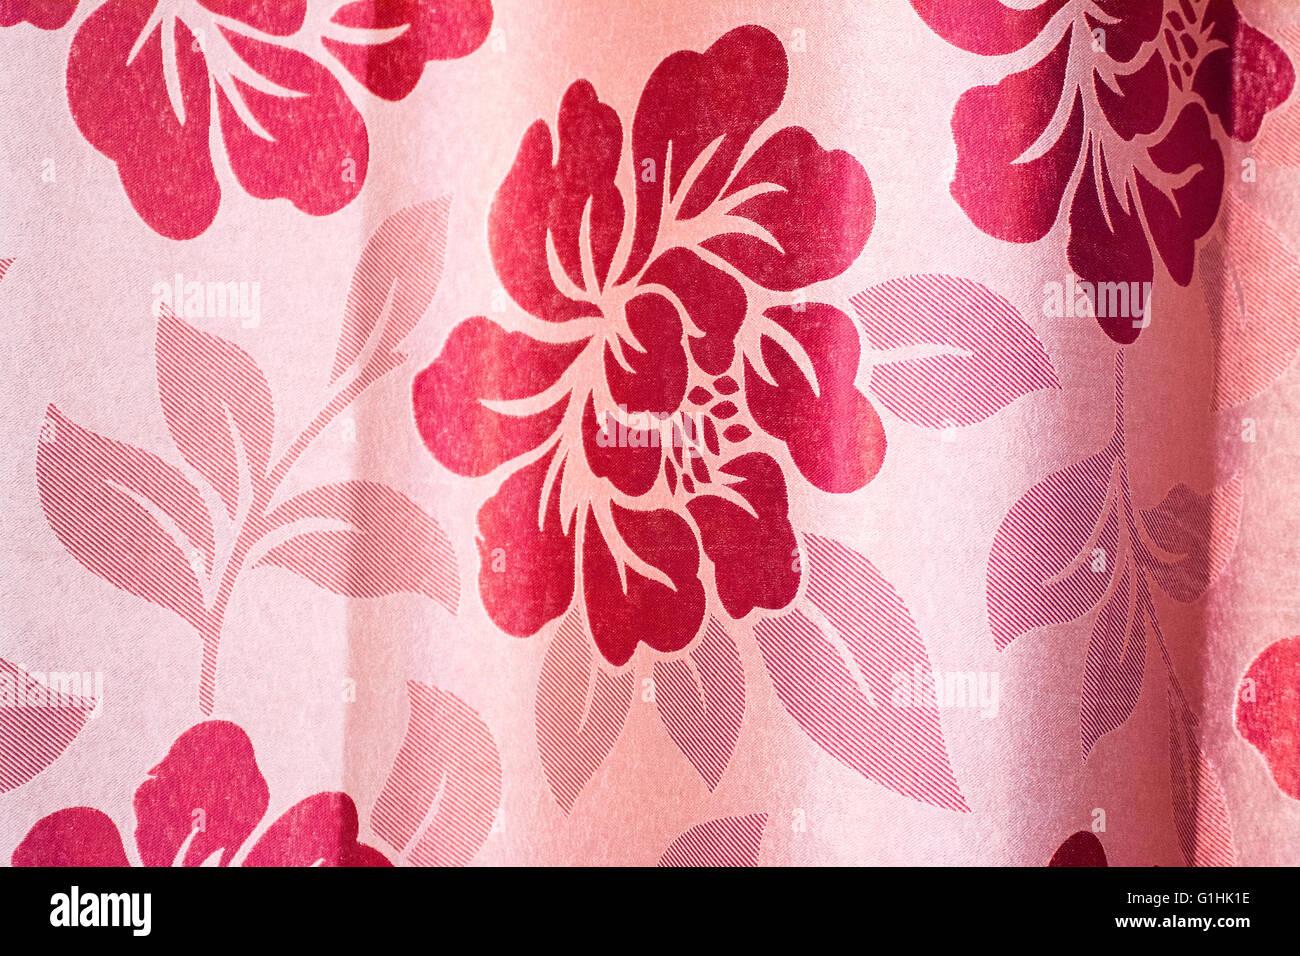 flower pattern form textile - Stock Image